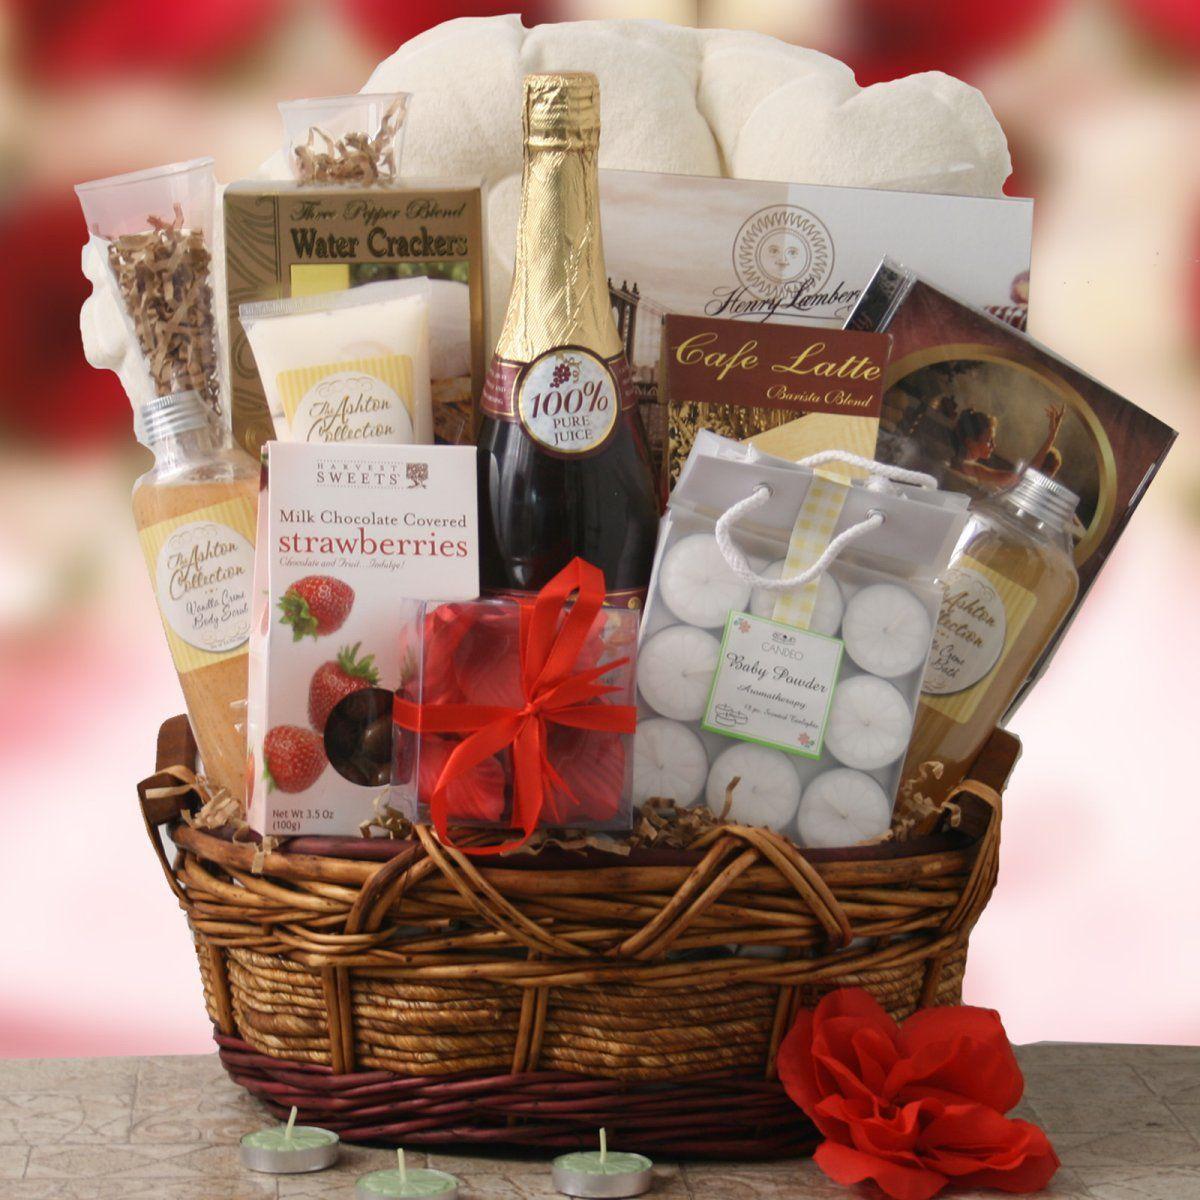 Everlasting love gift basket bubble bath lotion body